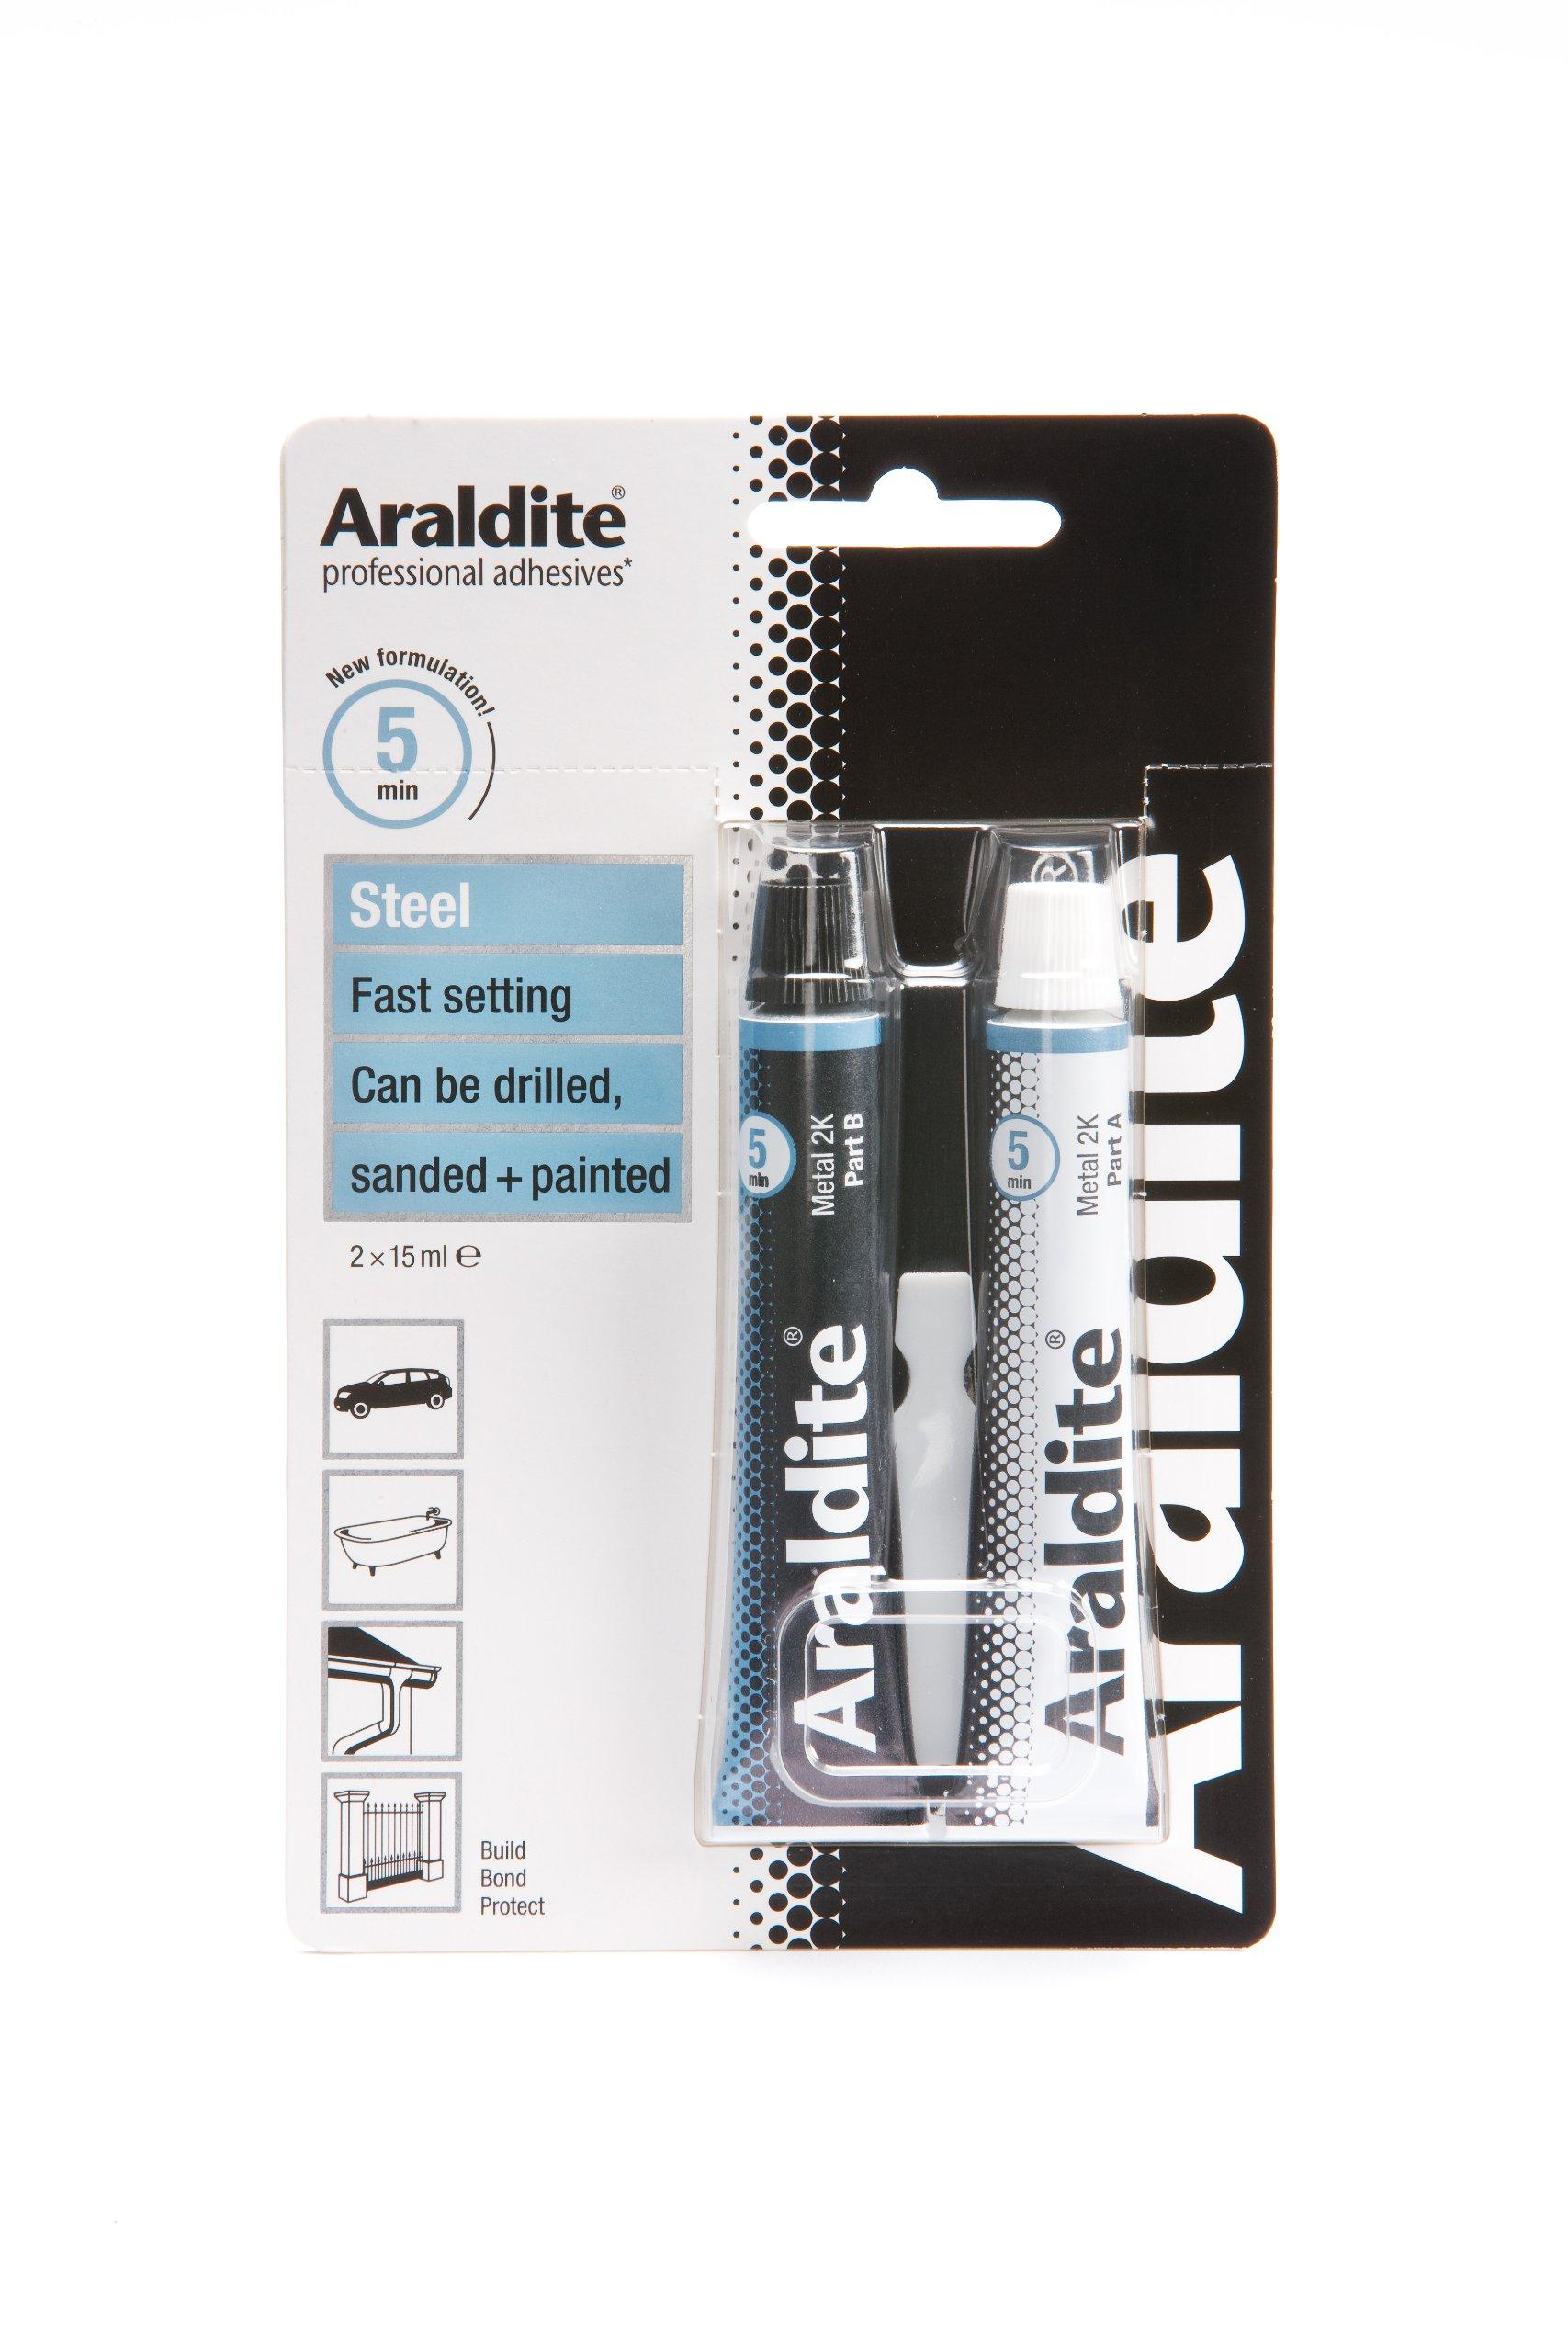 Araldite ARA-400010 Steel 15ml 2-Tubes Epoxy, Clear